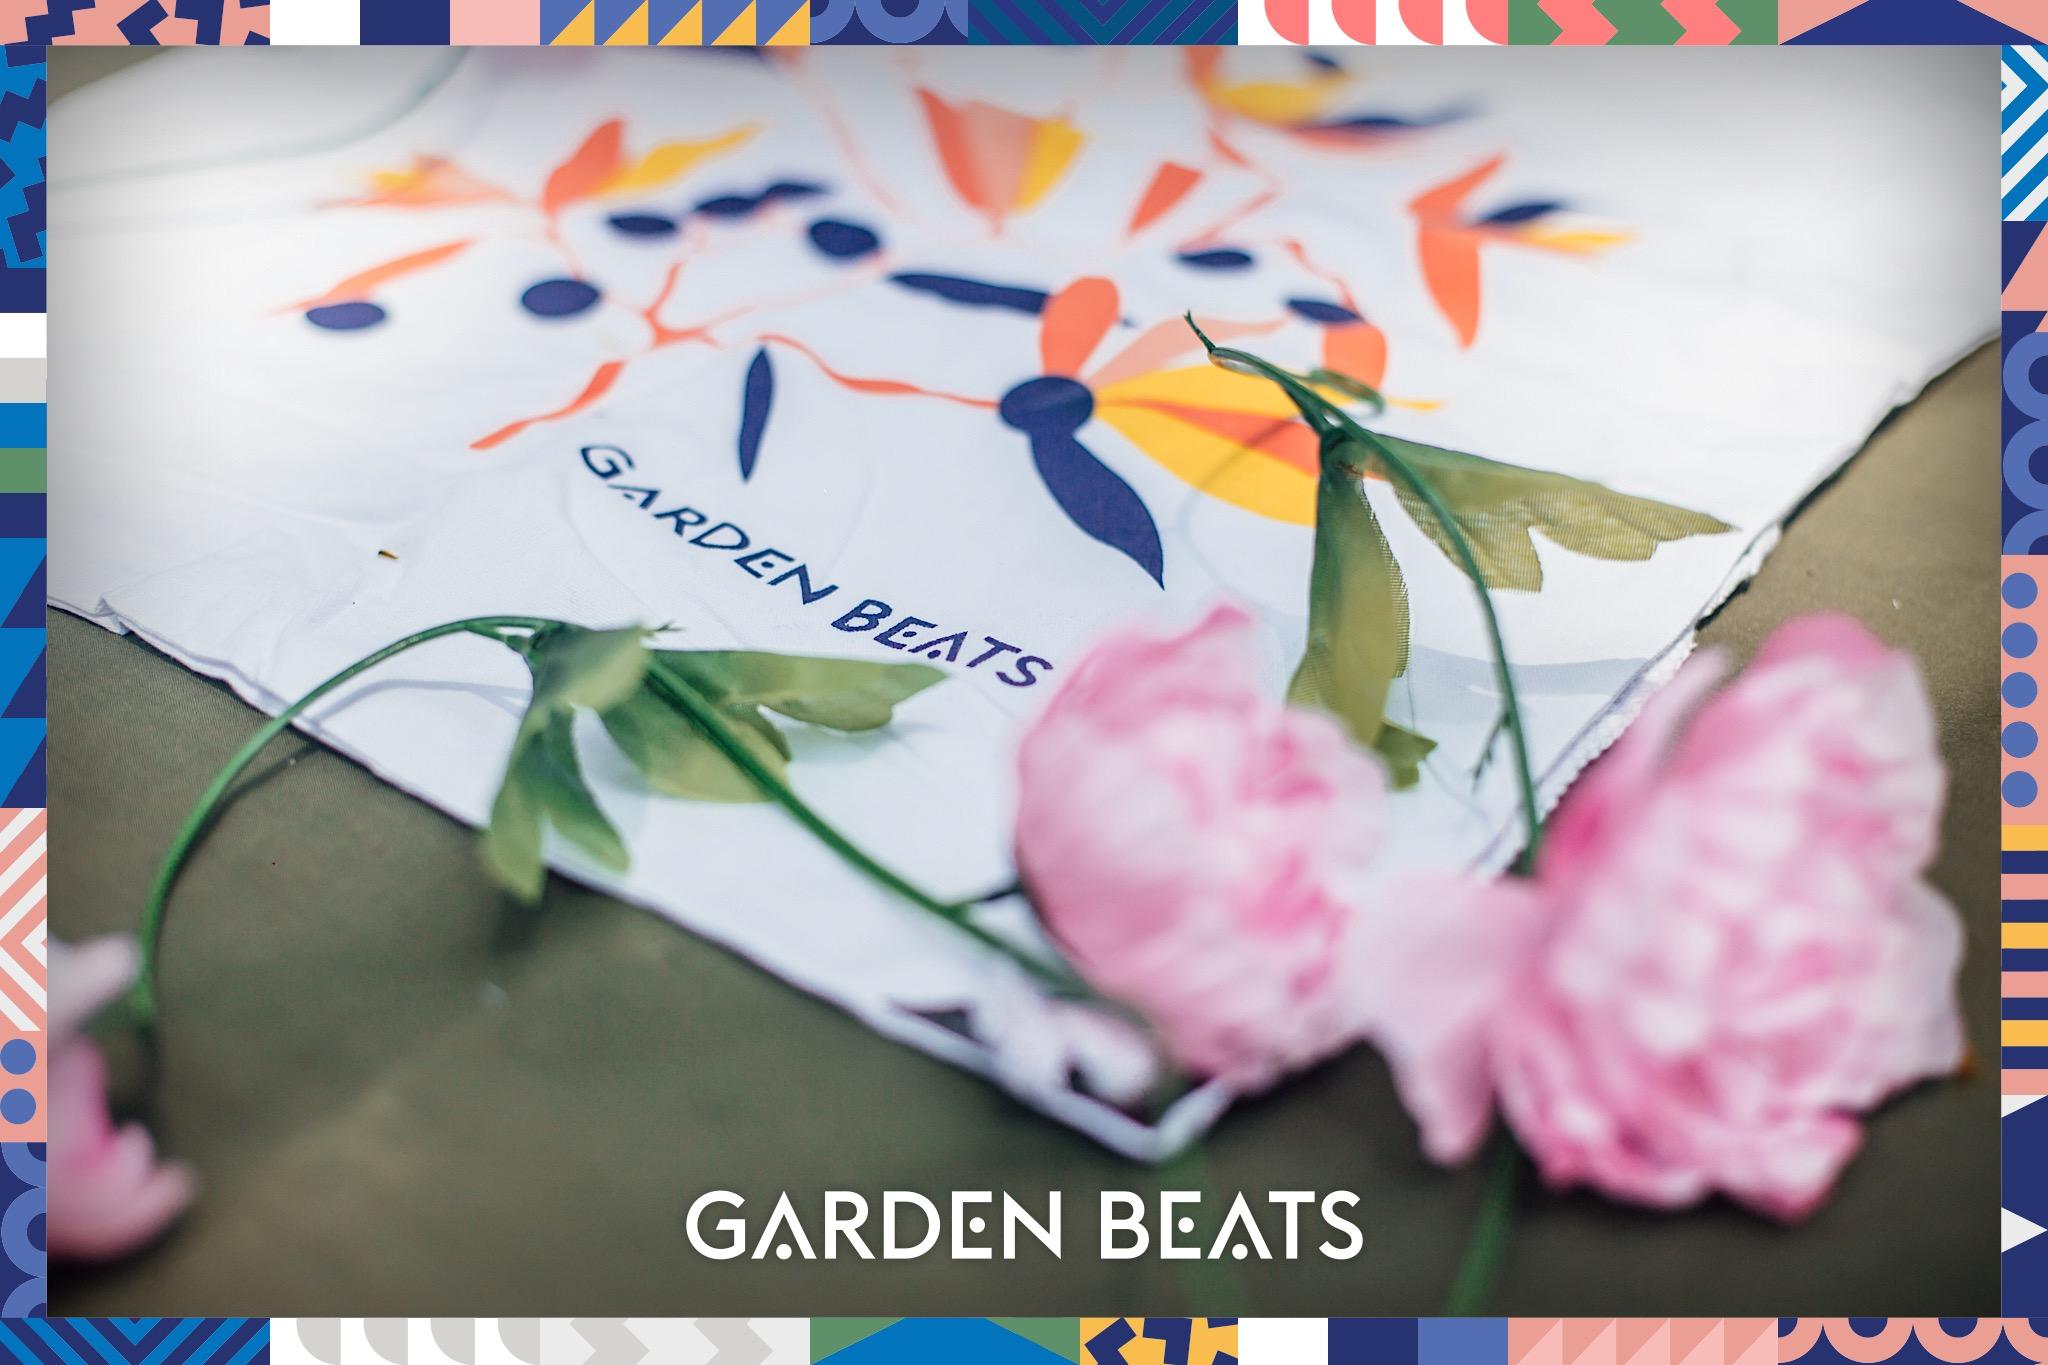 18032017_GardenBeats_Colossal168_WatermarkedGB.jpg